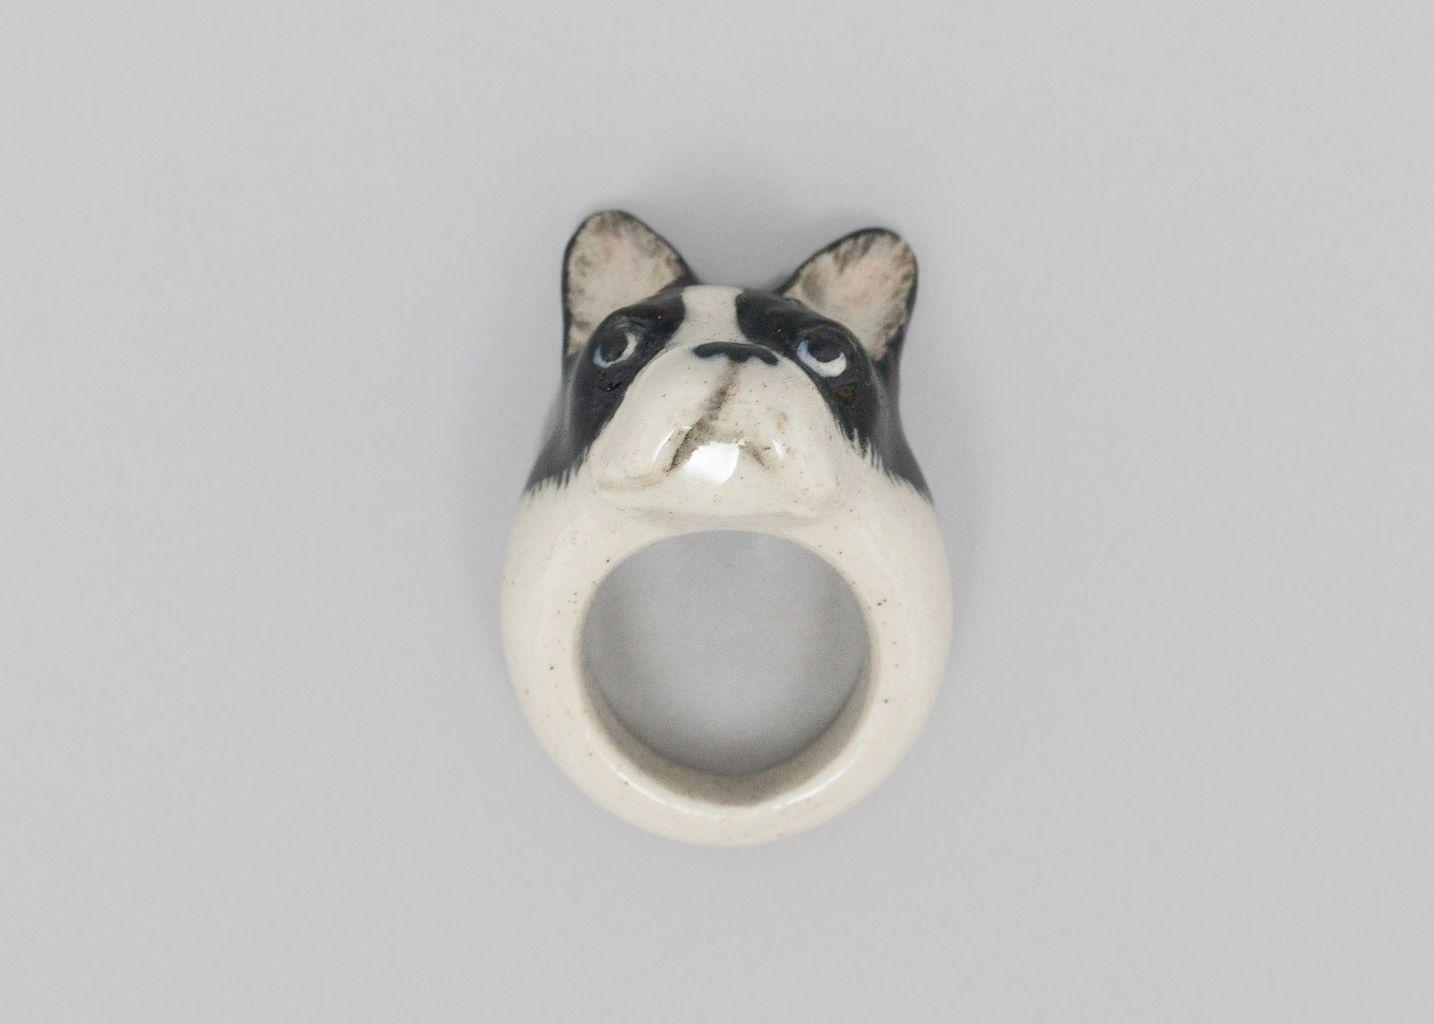 Bague Bulldog - Nach